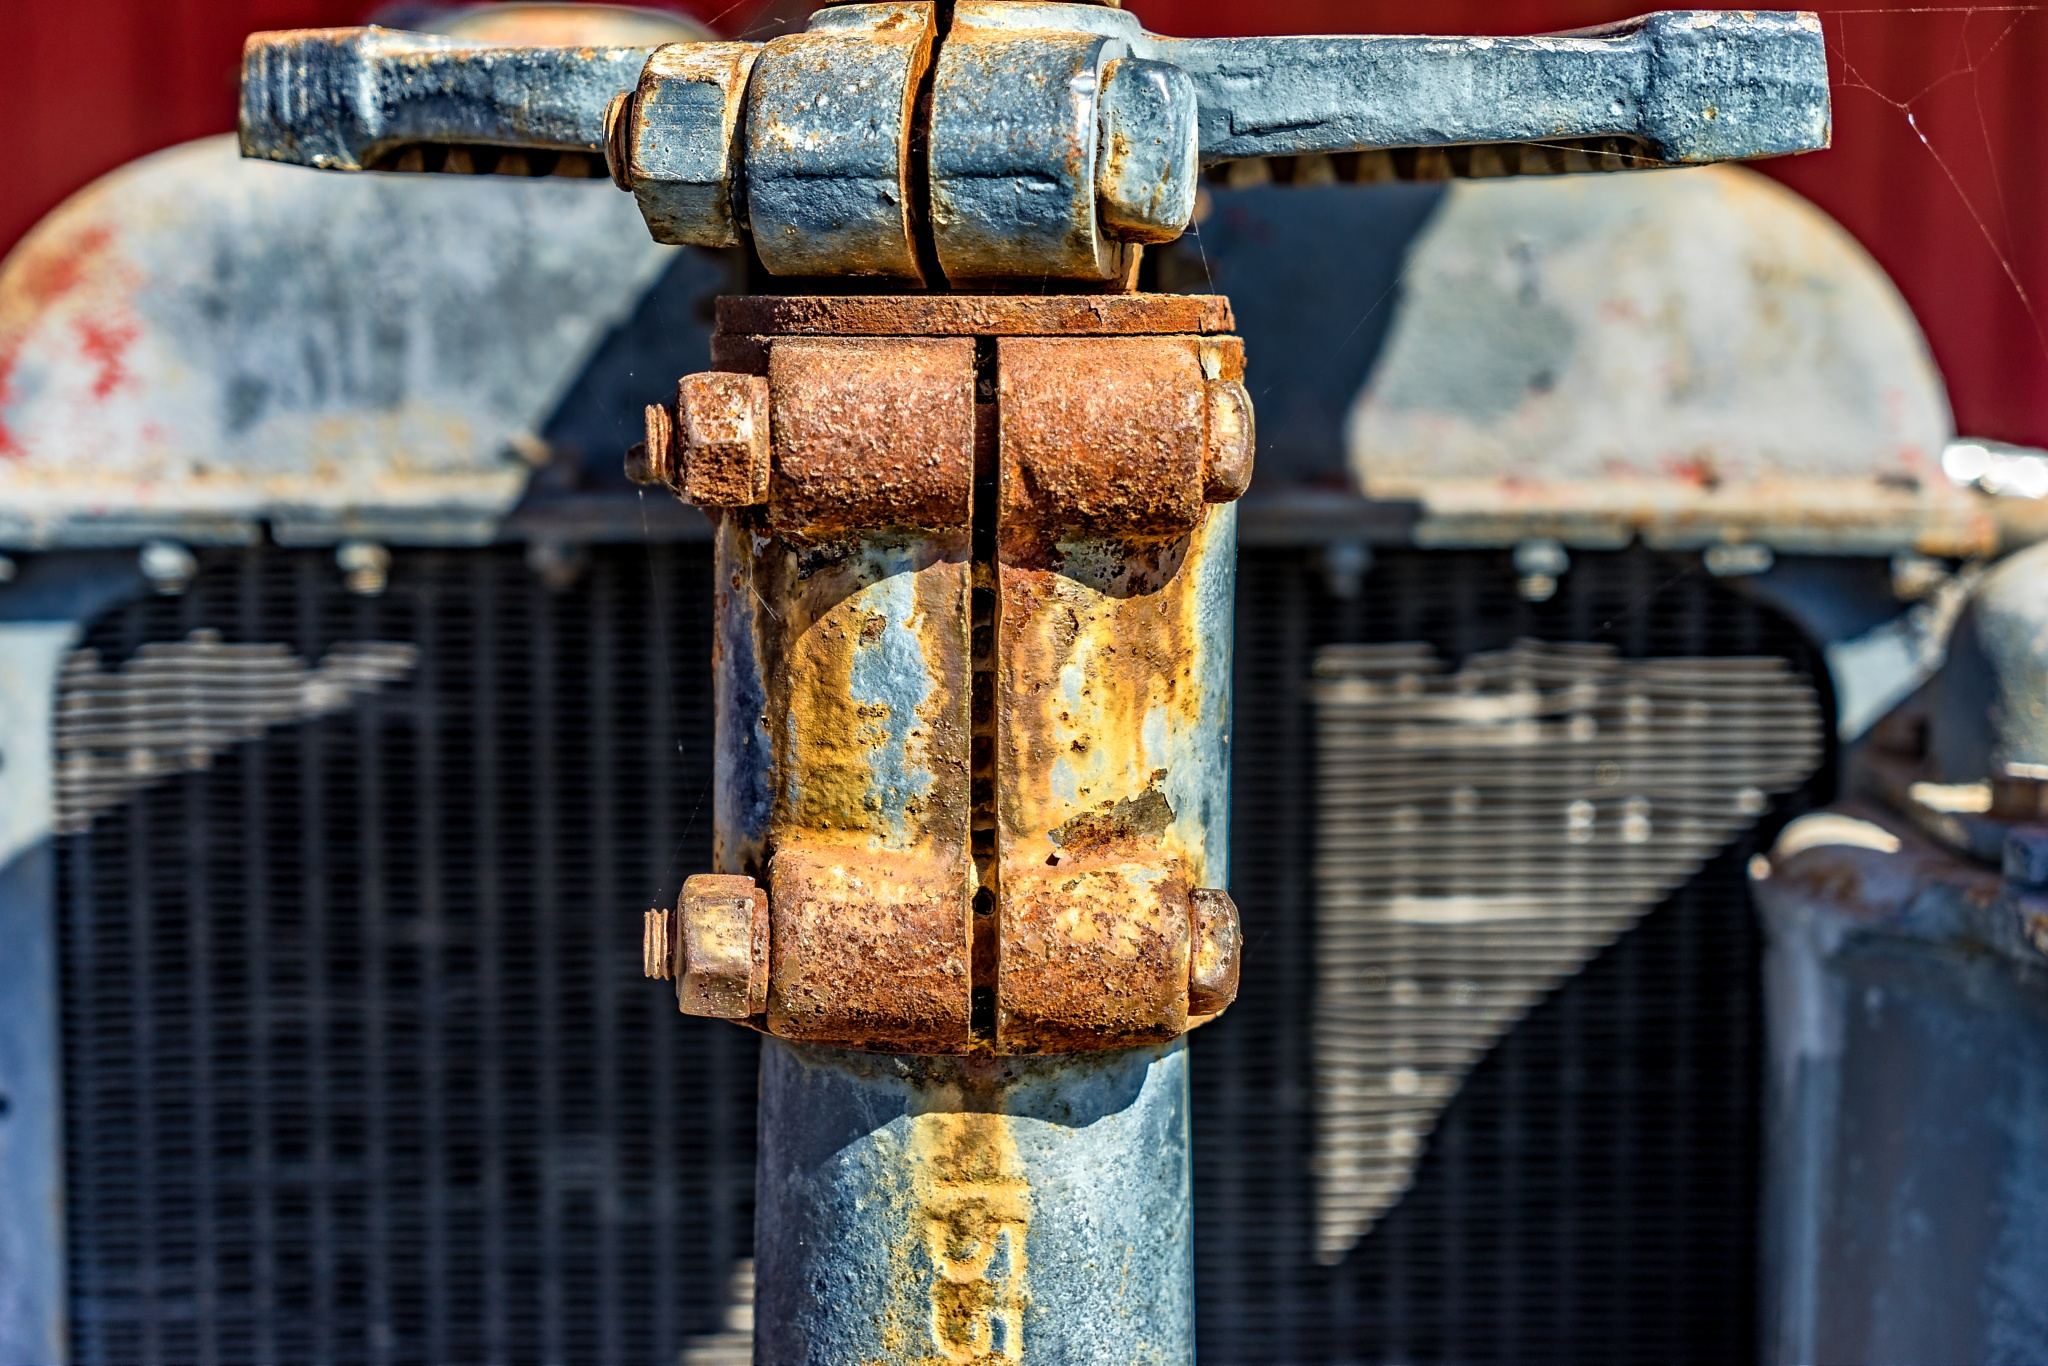 Radiator Rust by Gary Posner